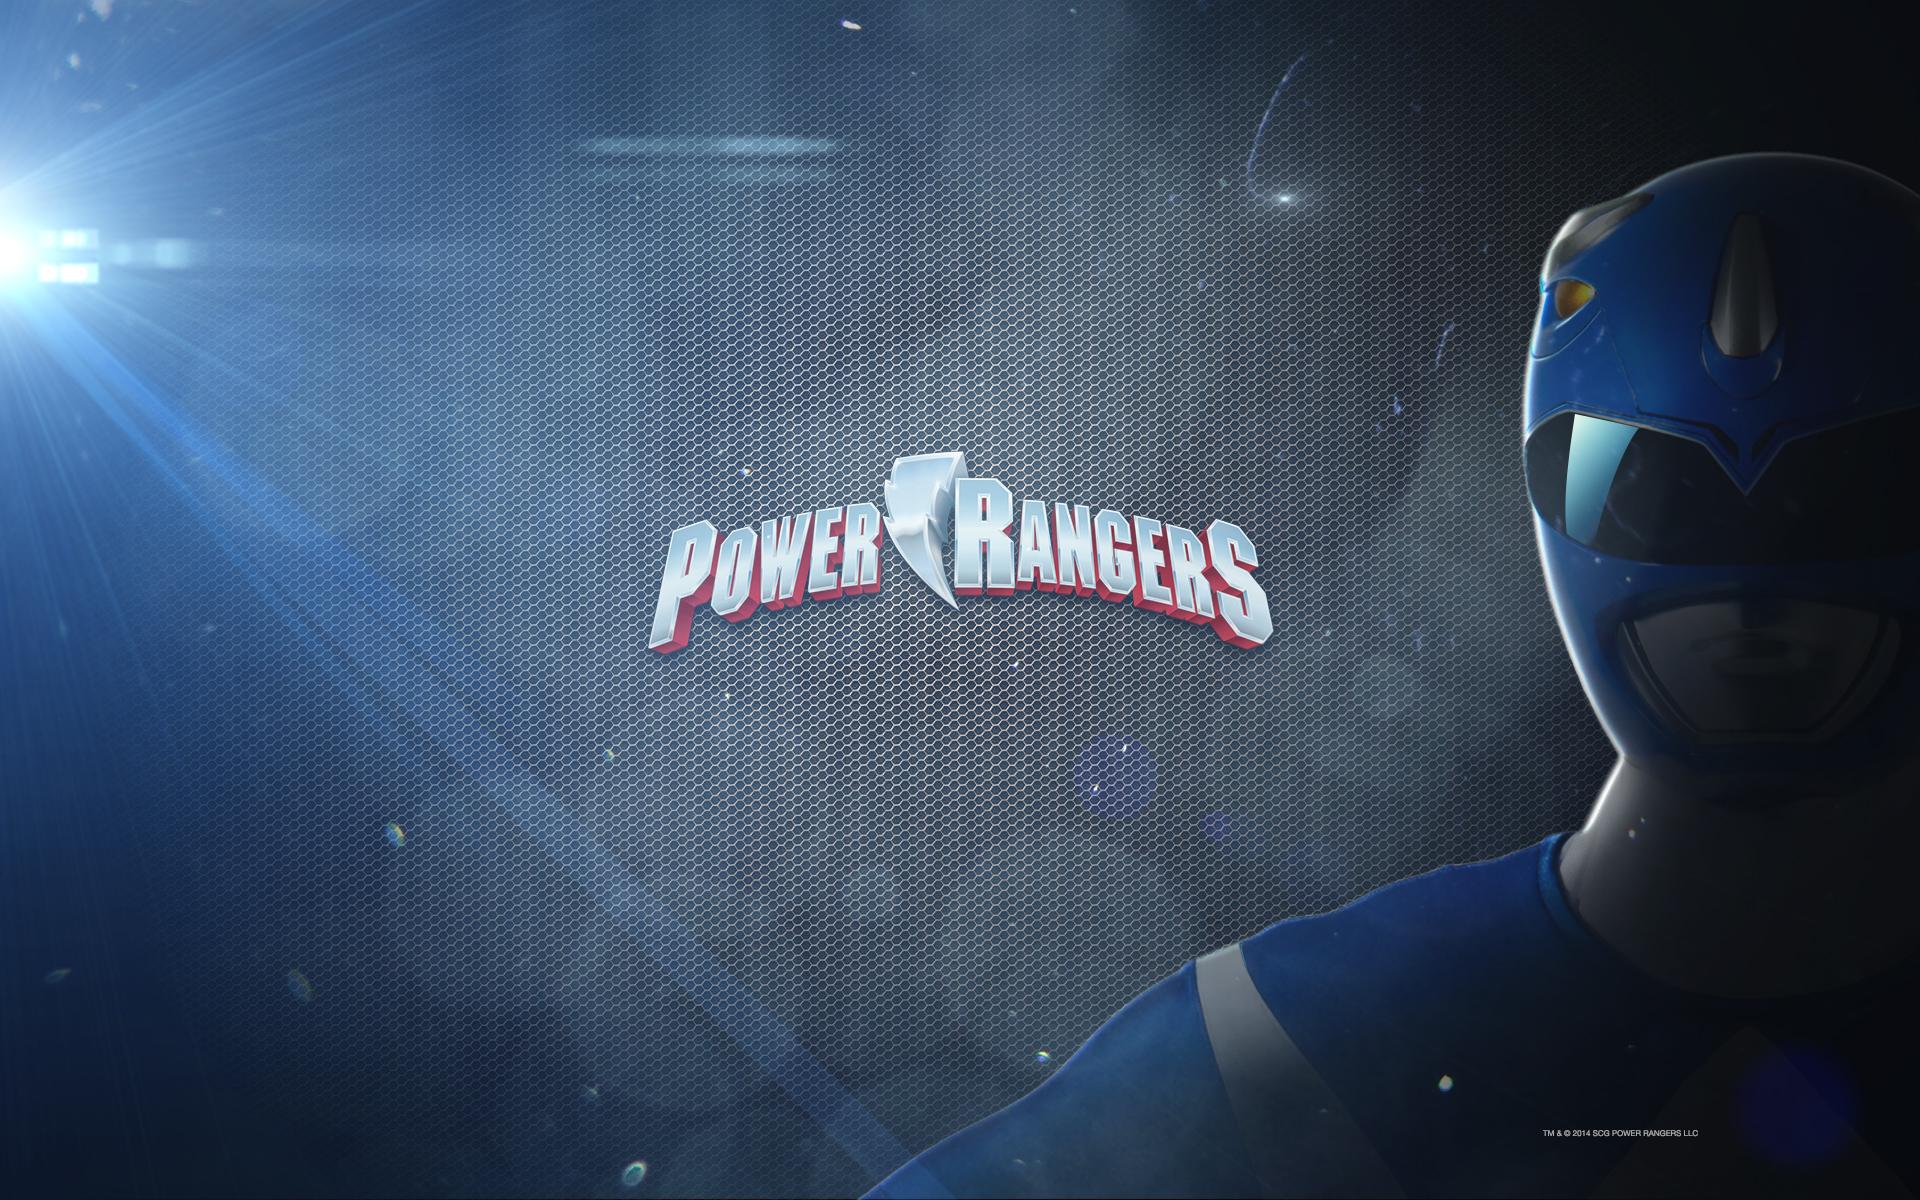 Mighty Morphin Power Rangers Iphone Wallpaper Hd Power Rangers Wallpapers Pixelstalk Net